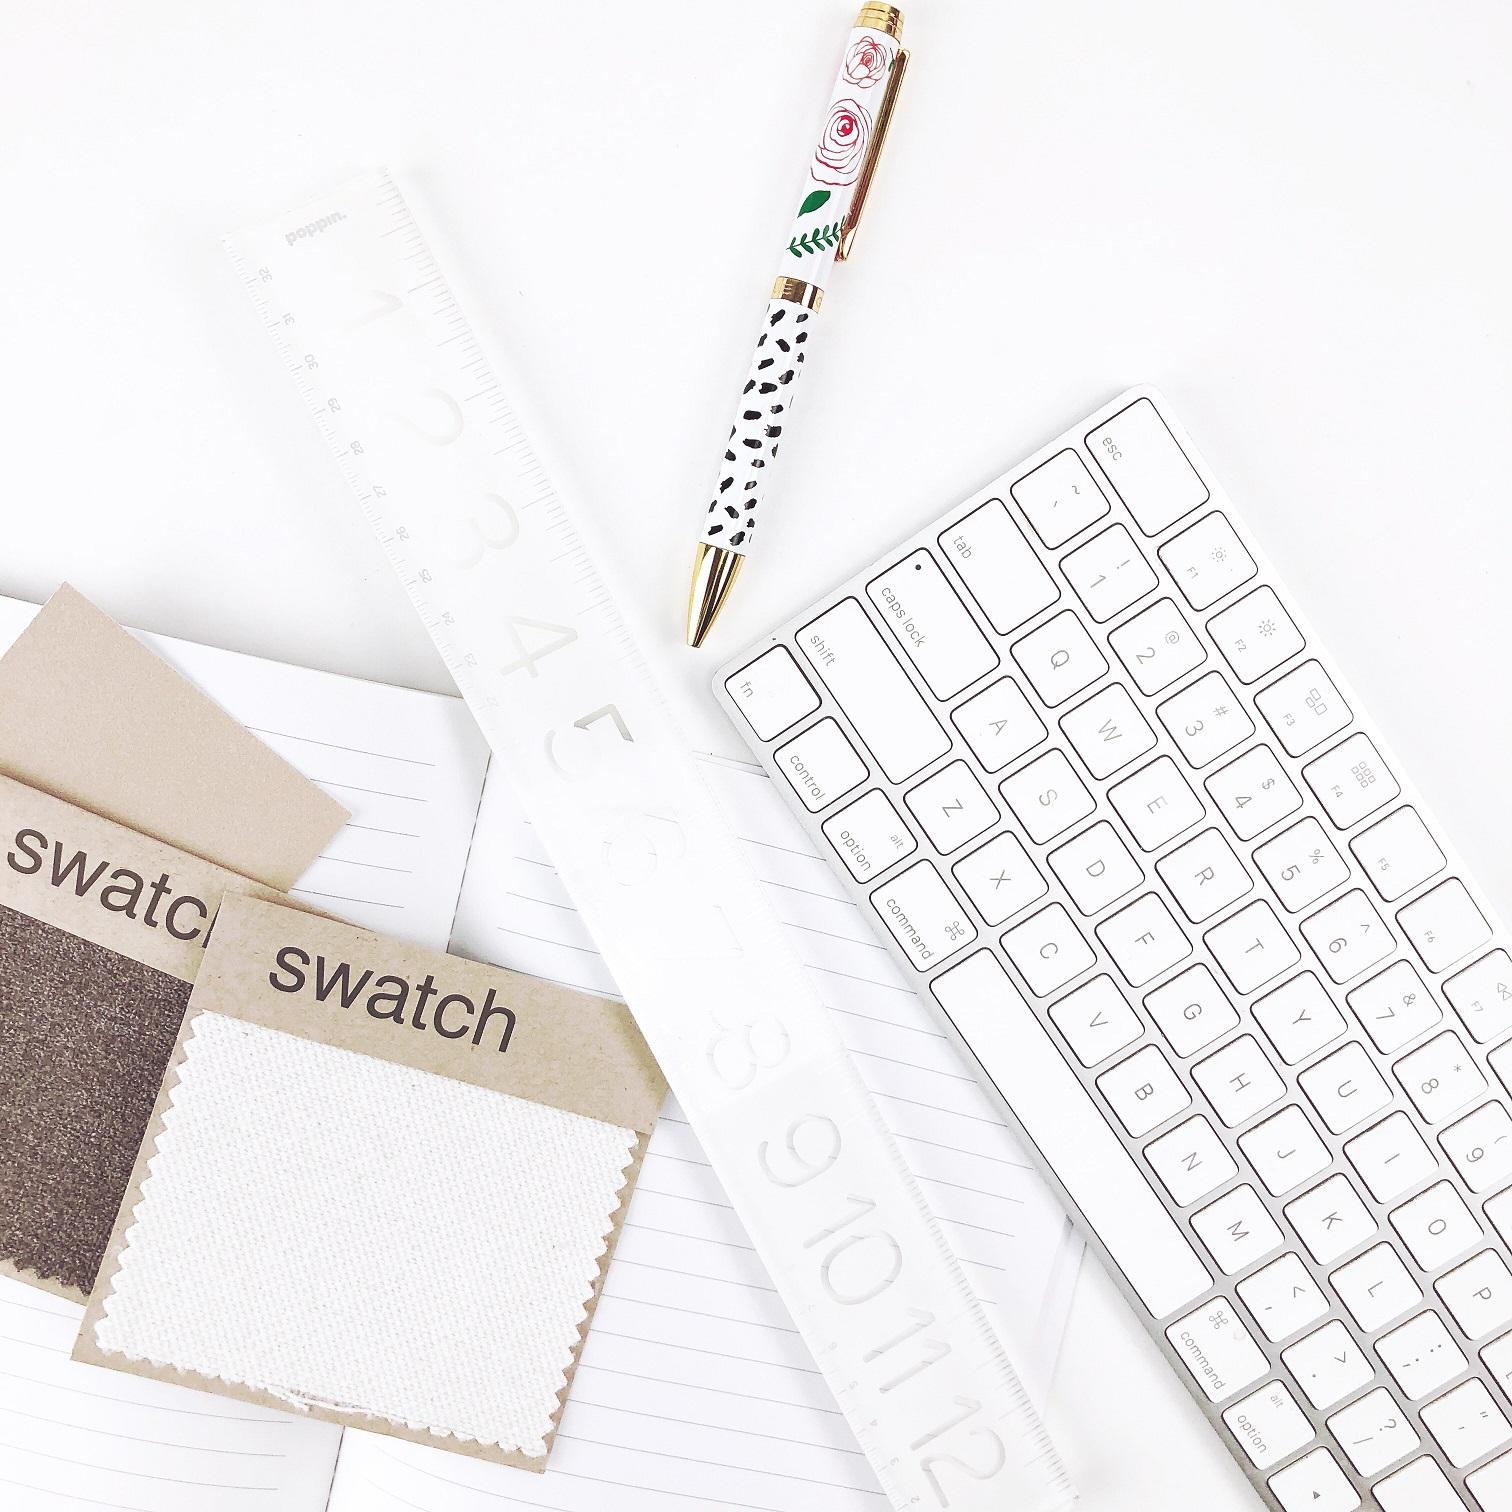 interior design home staging window workroom marketing blogging tools